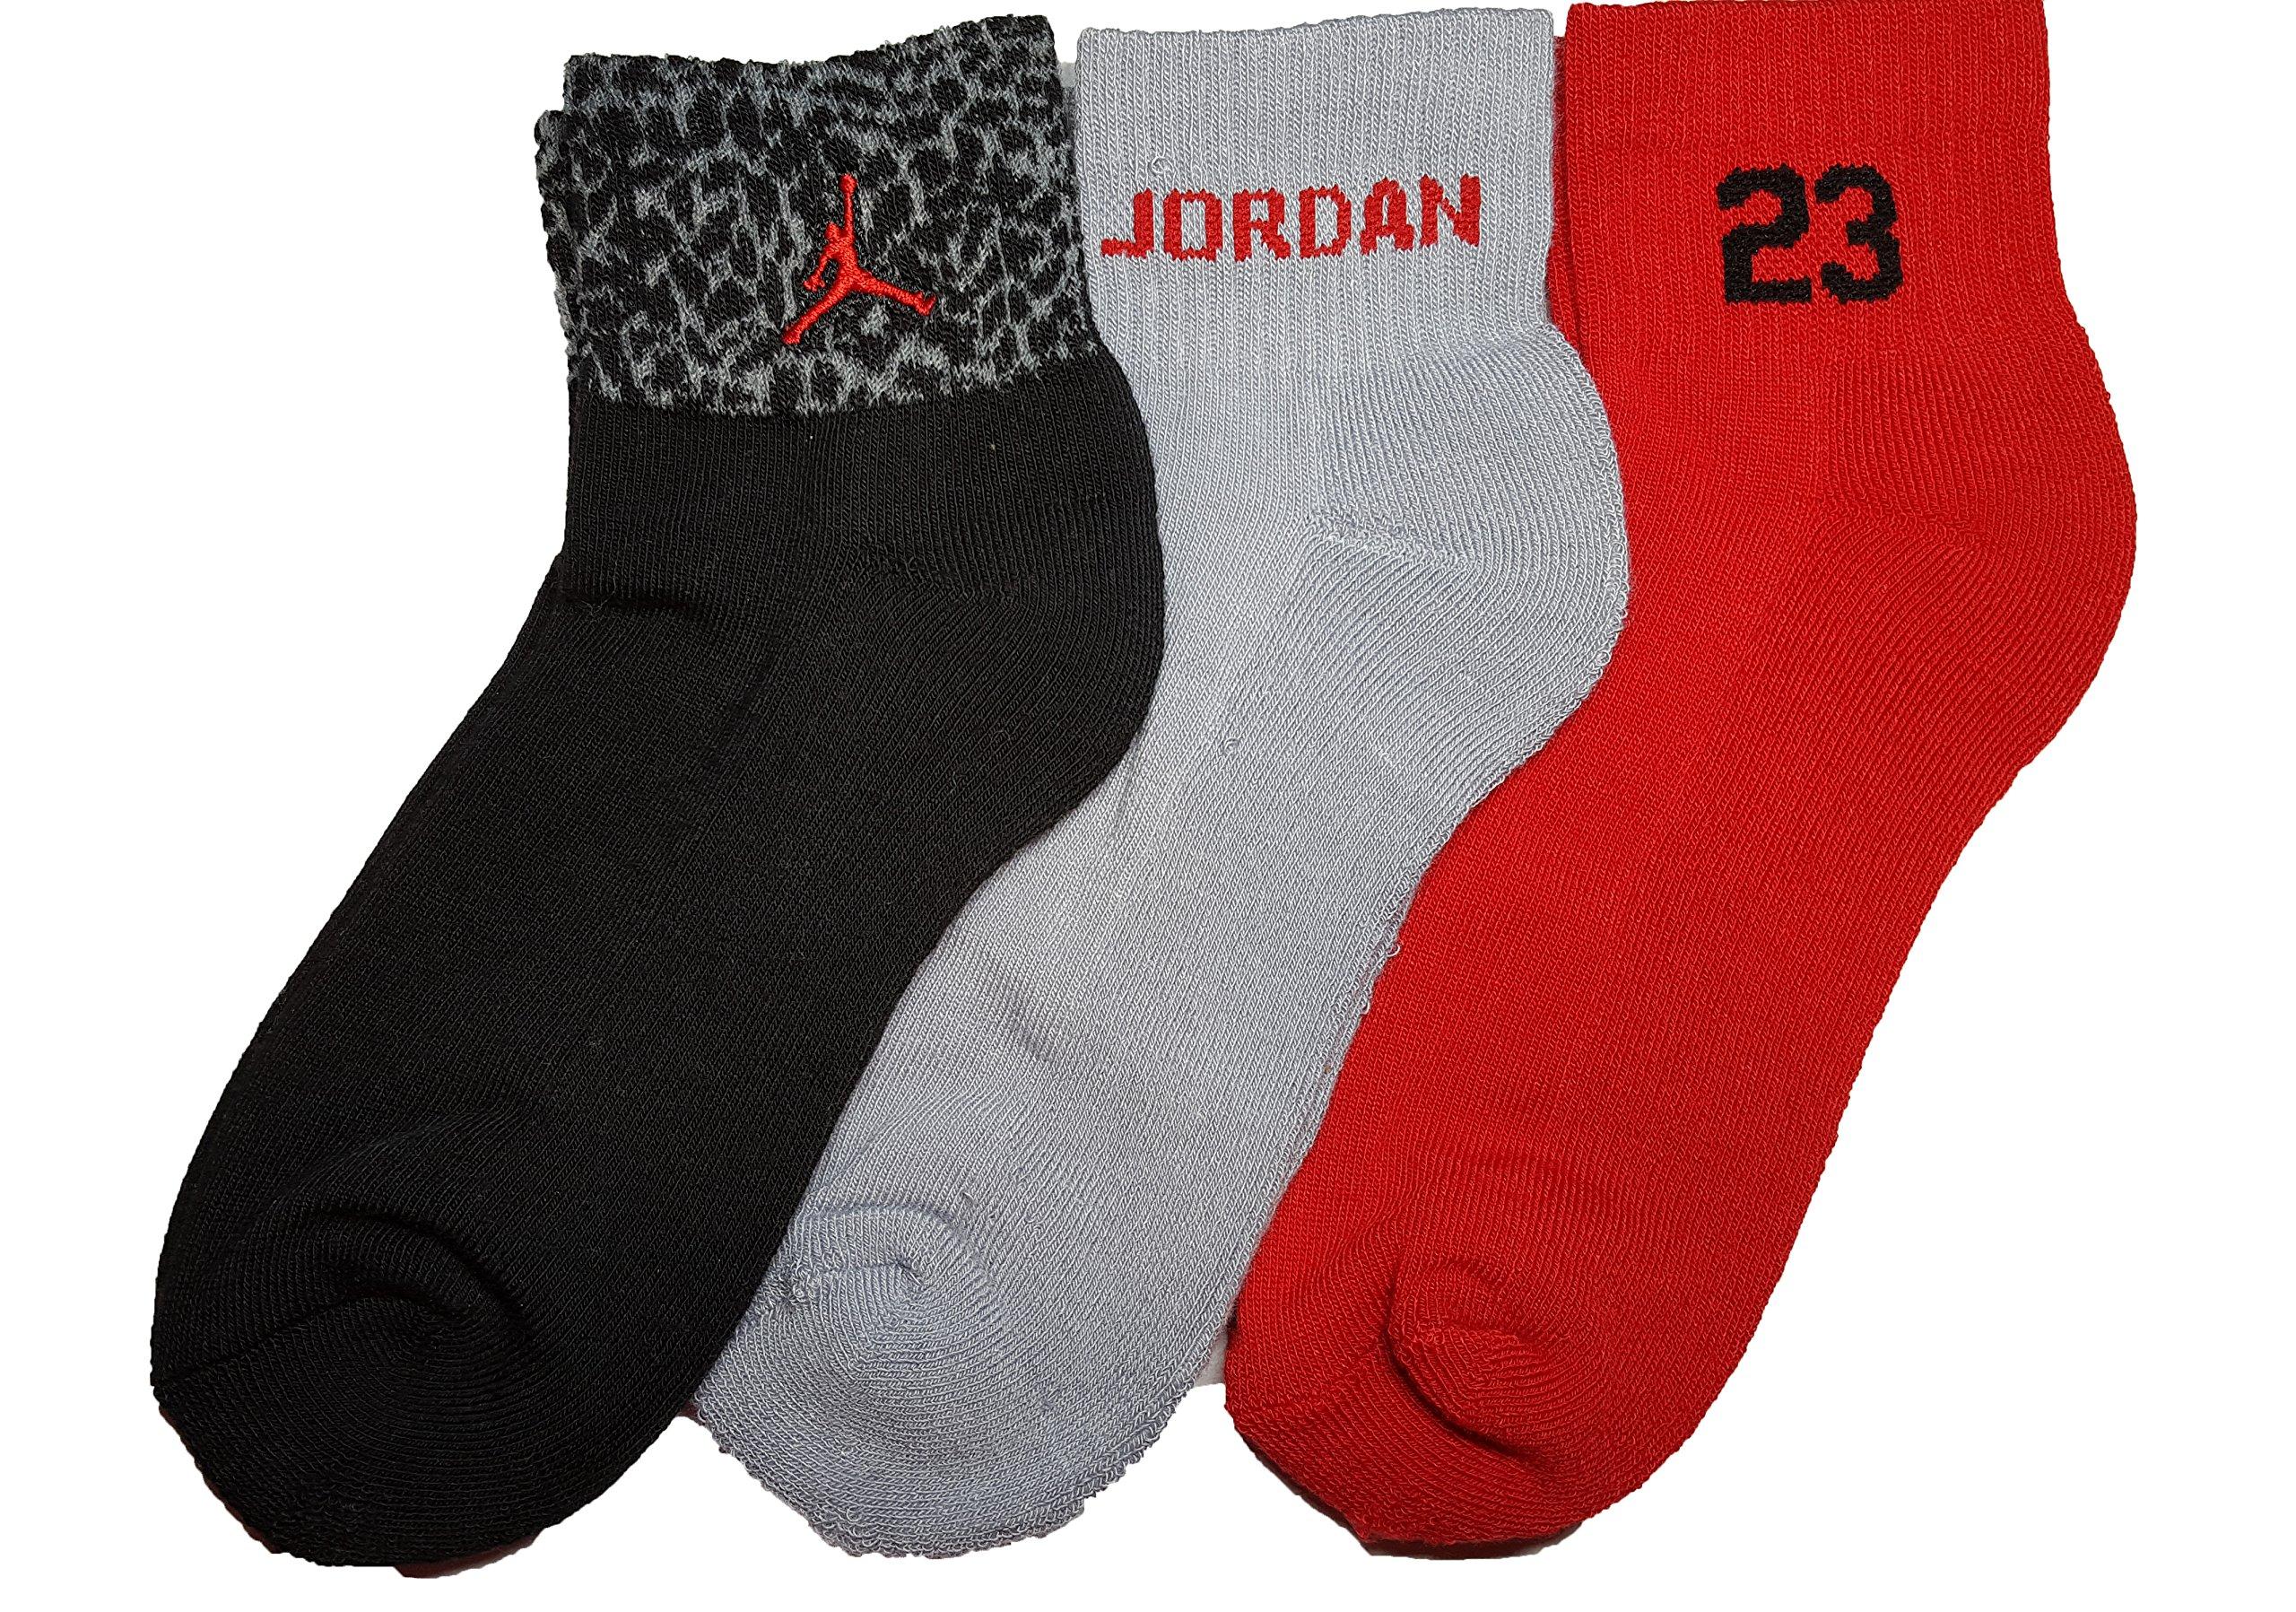 Nike Air Jordan Boys Elephant Print 3 Pr/P Quarter Socks Size 5Y-7Y/9-11